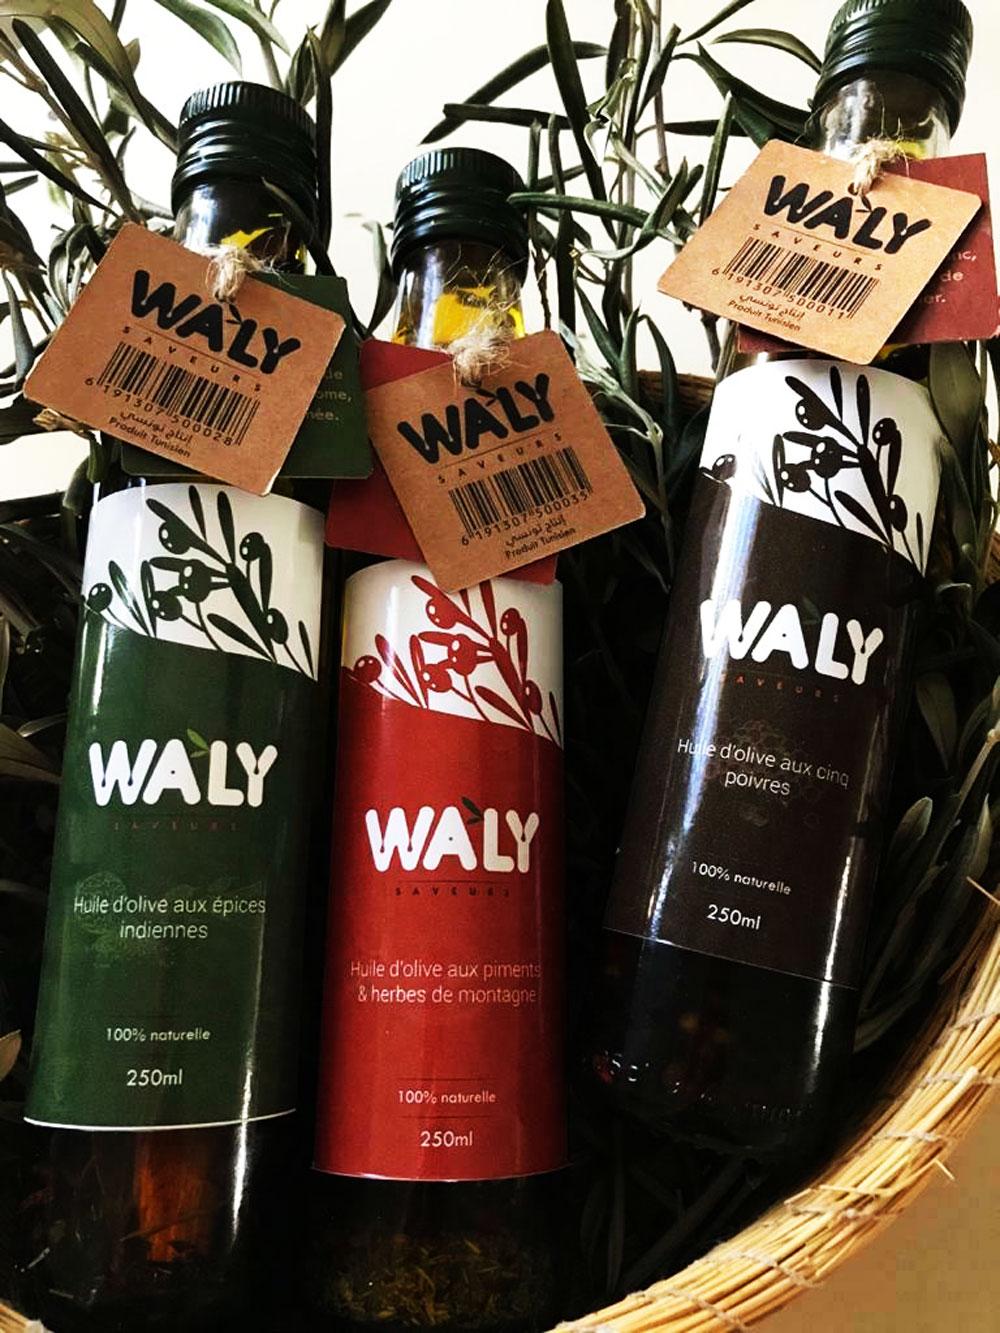 waly-161220-2.jpg